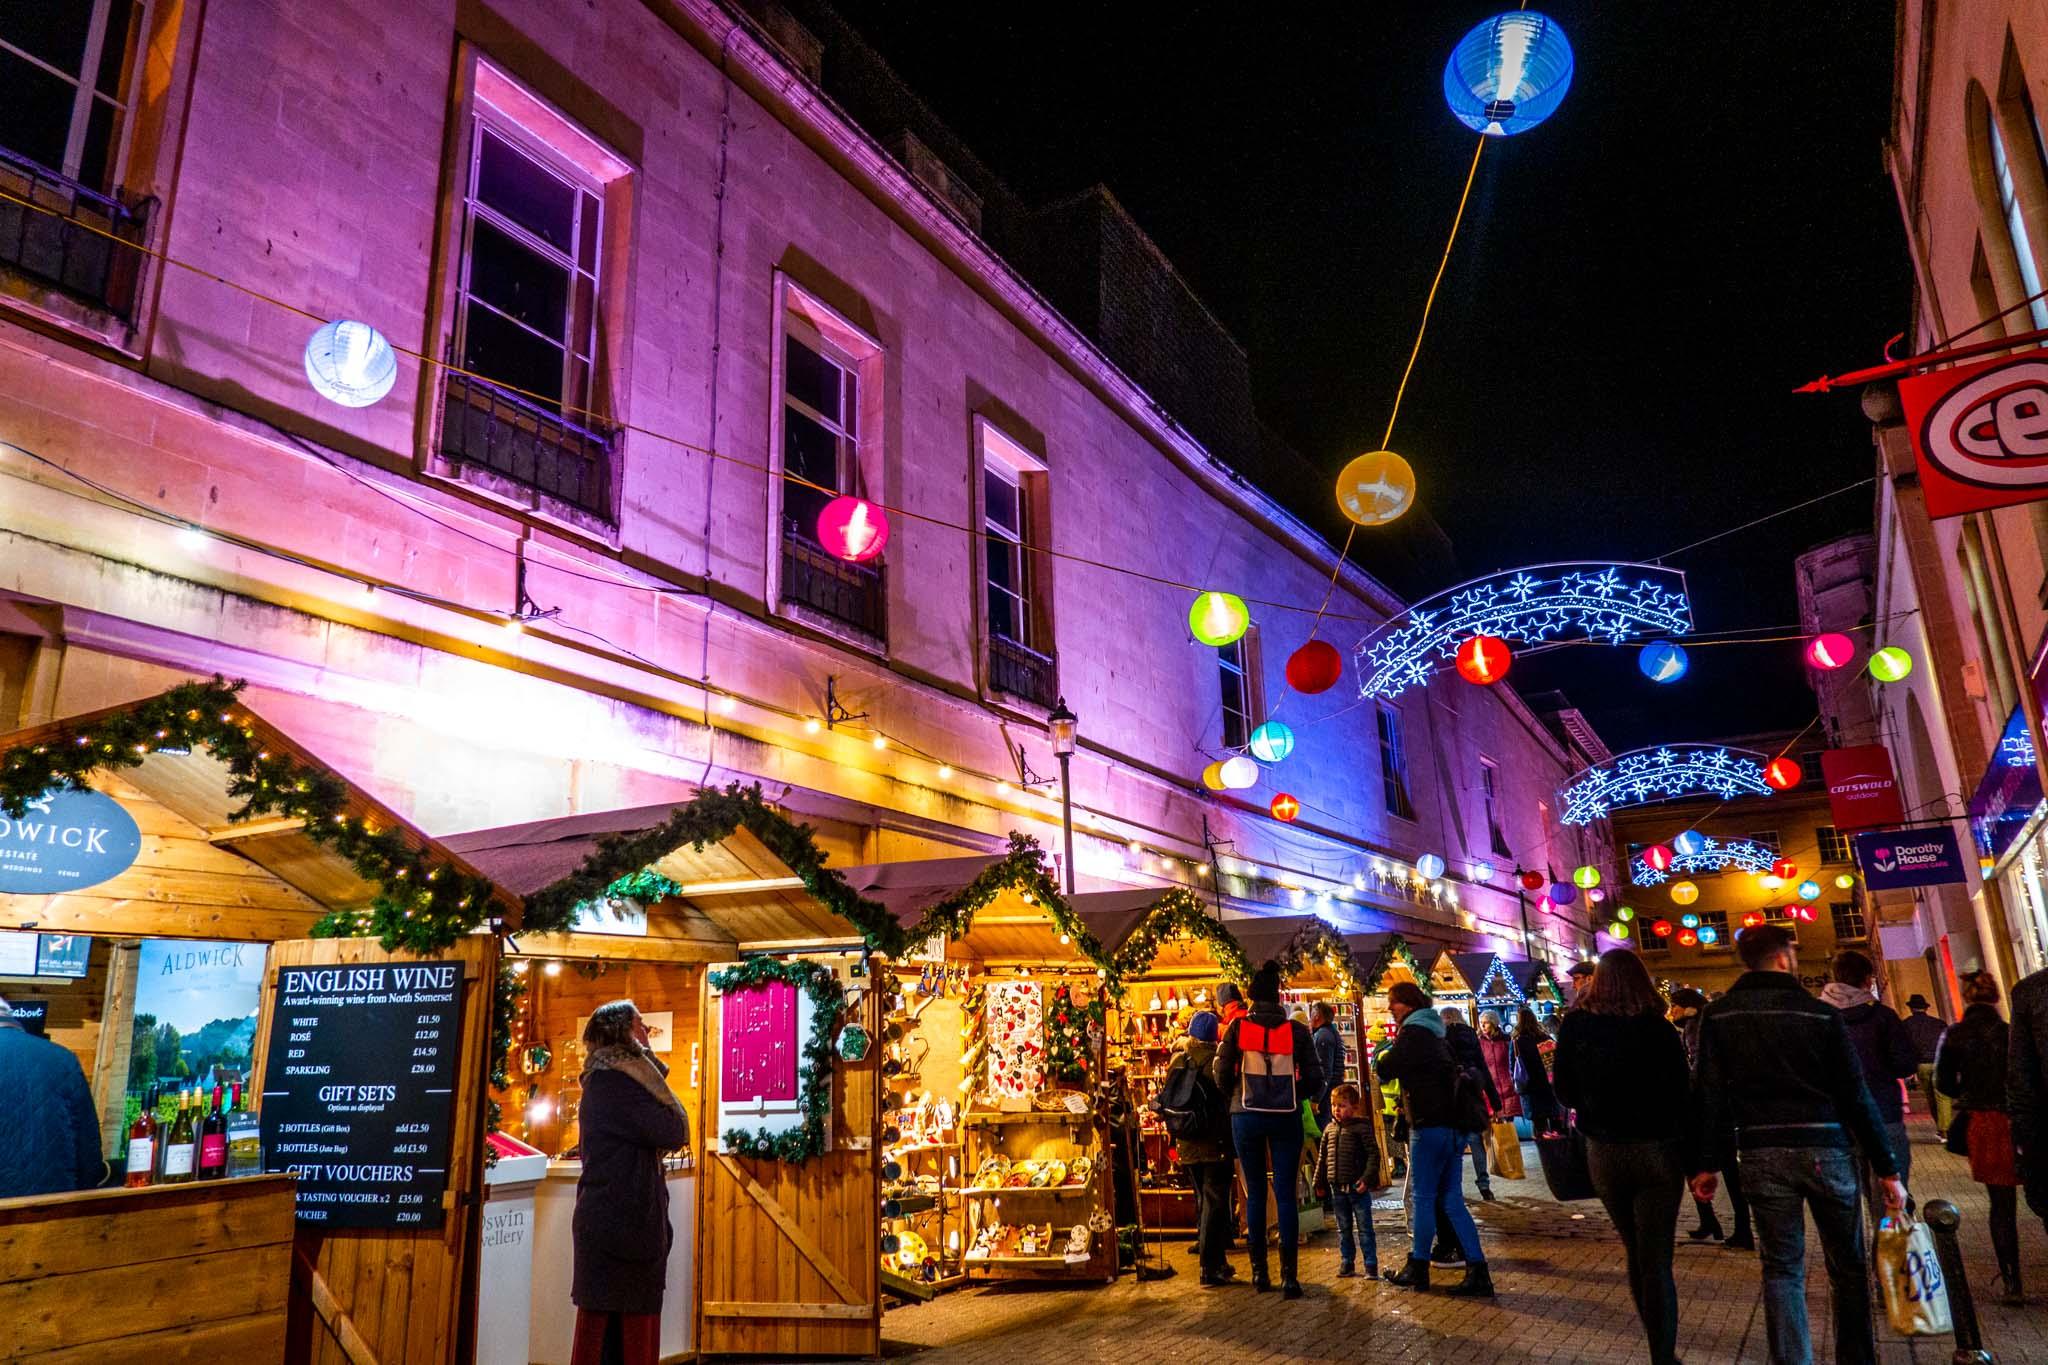 Market stalls along Abbeygate Street in Bath, England